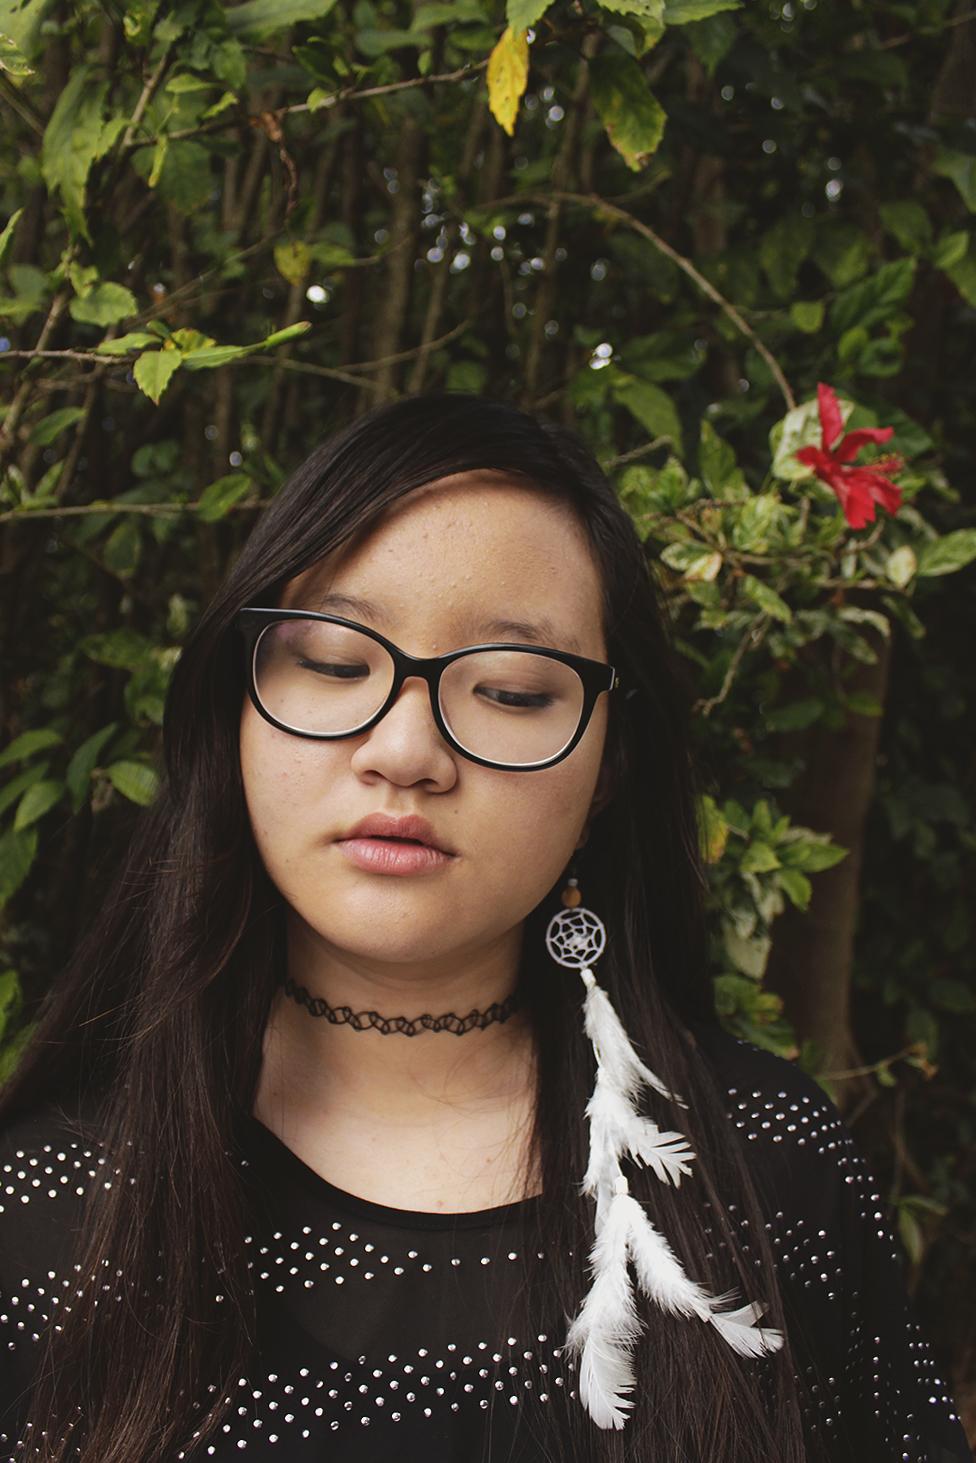 foto-jovem-adolescente